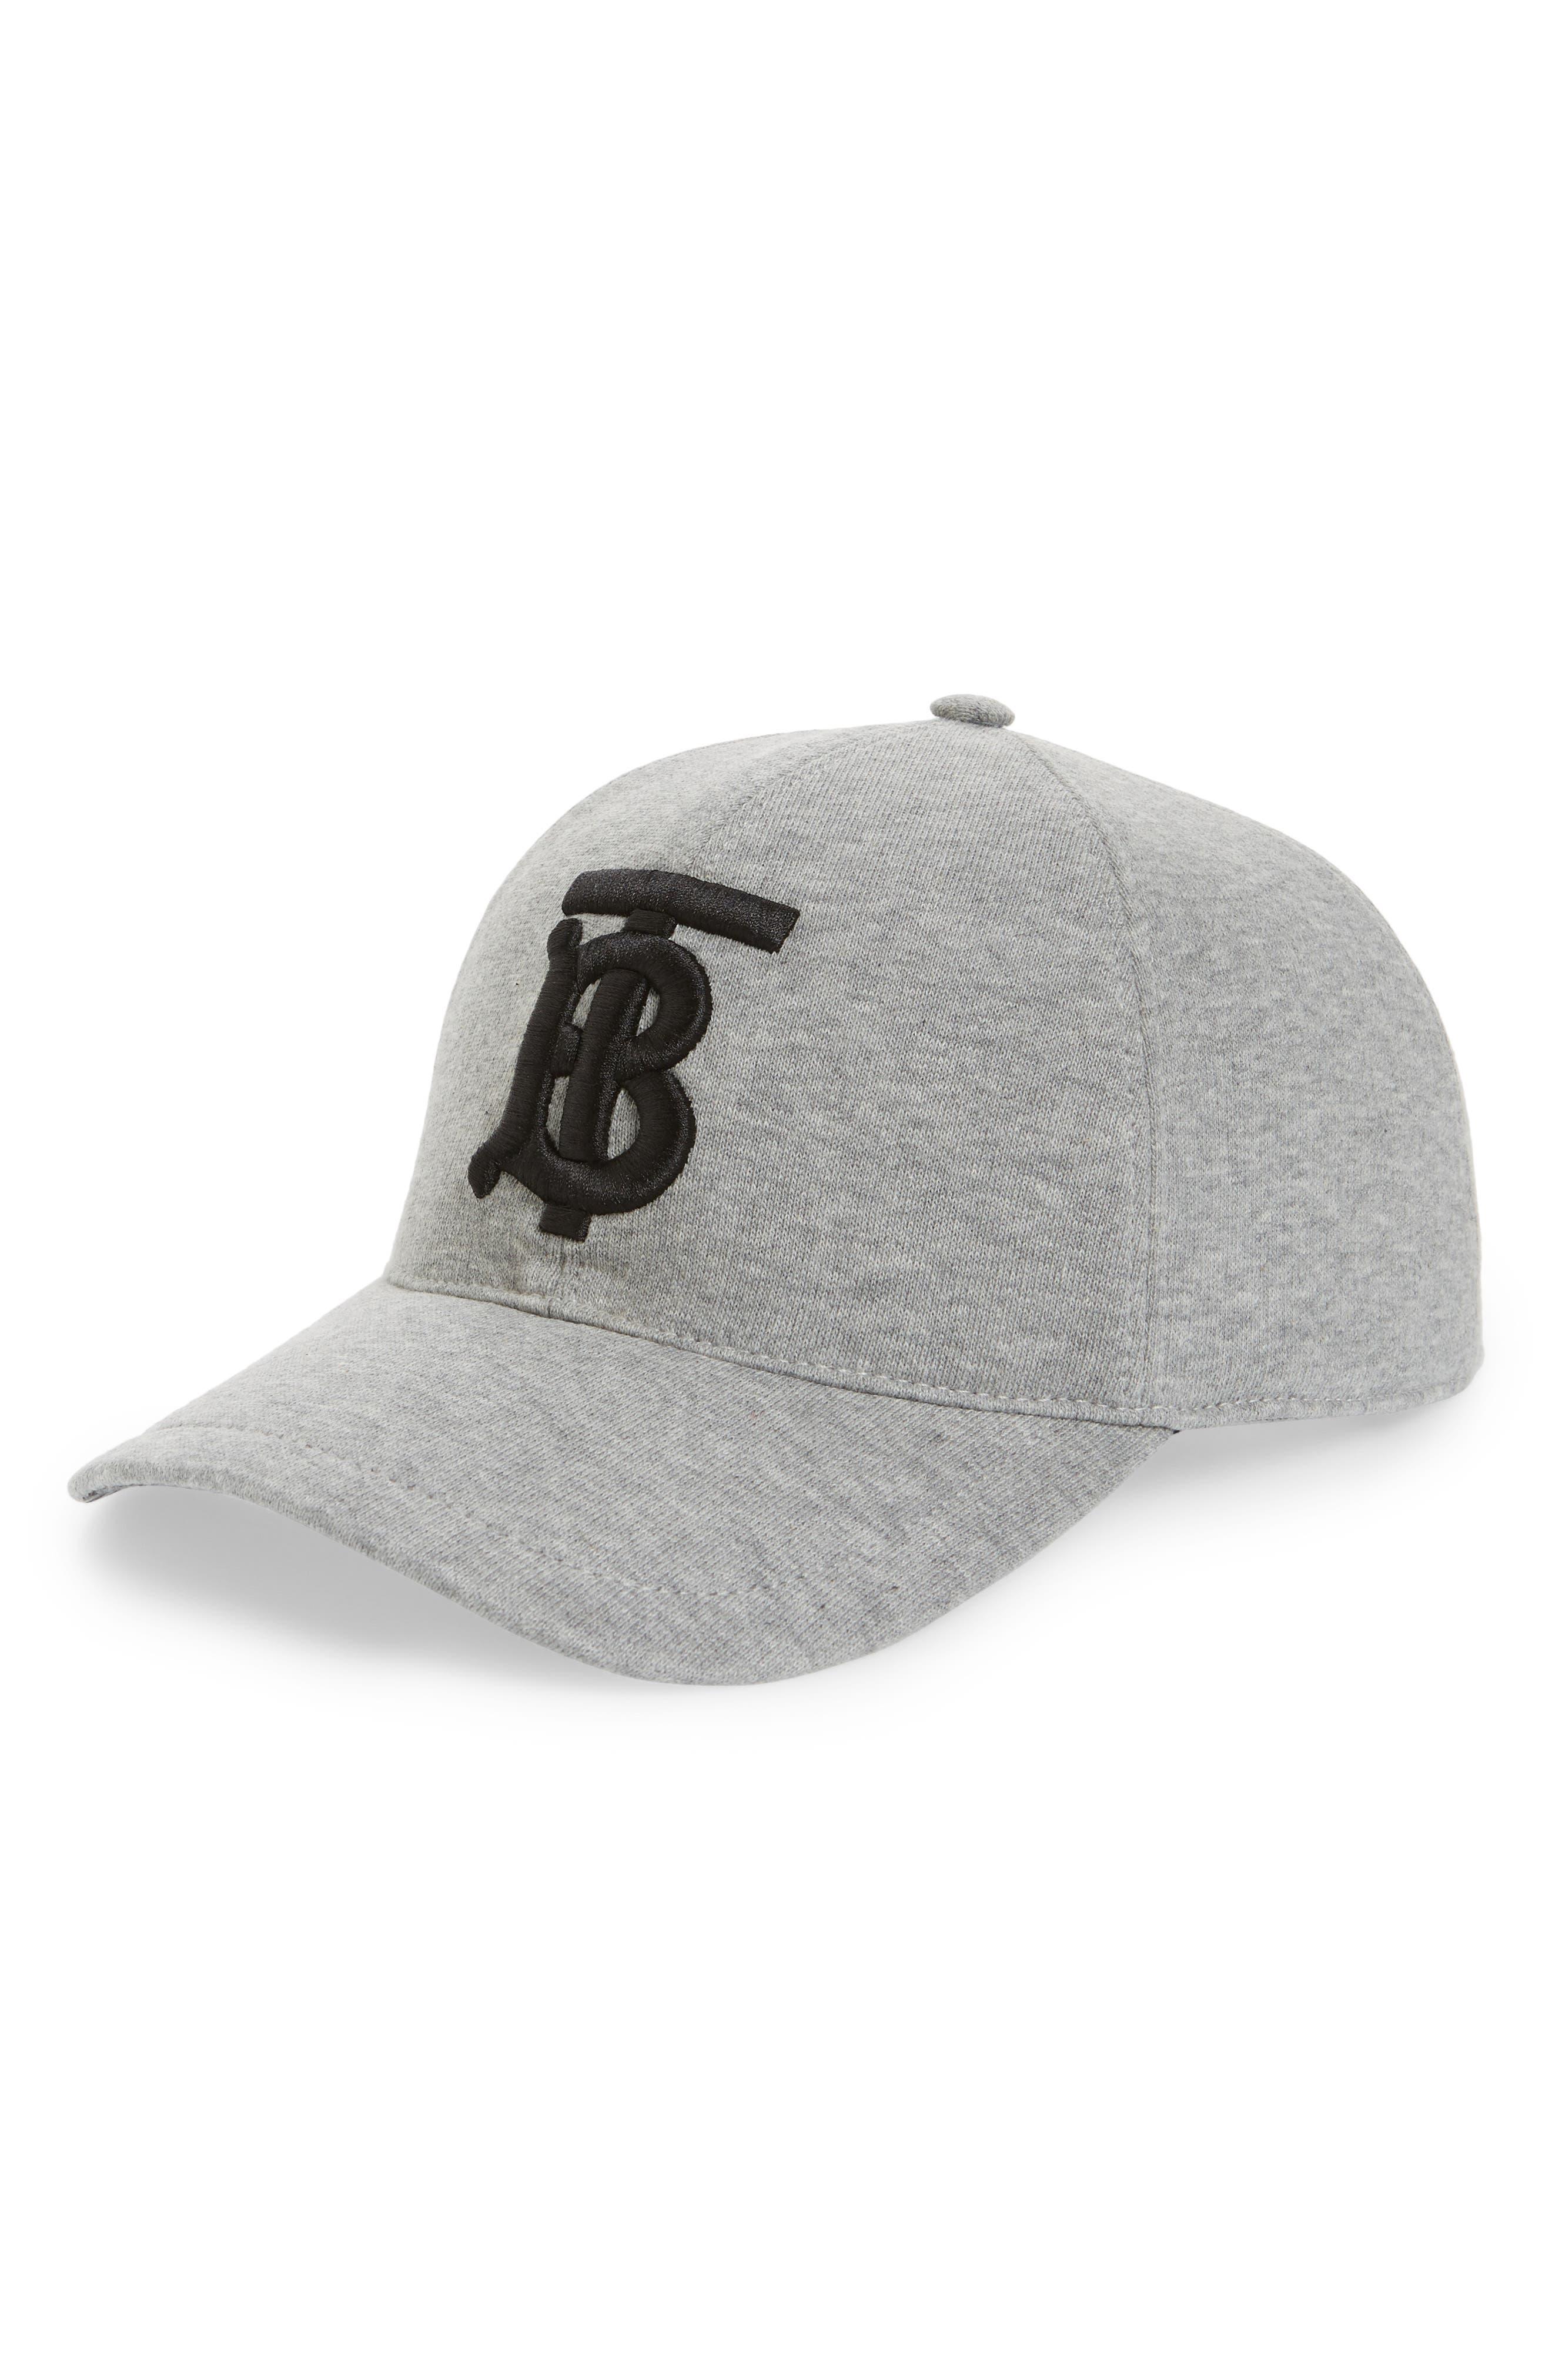 BURBERRY, Jersey Baseball Cap, Main thumbnail 1, color, LIGHT GREY MELANGE